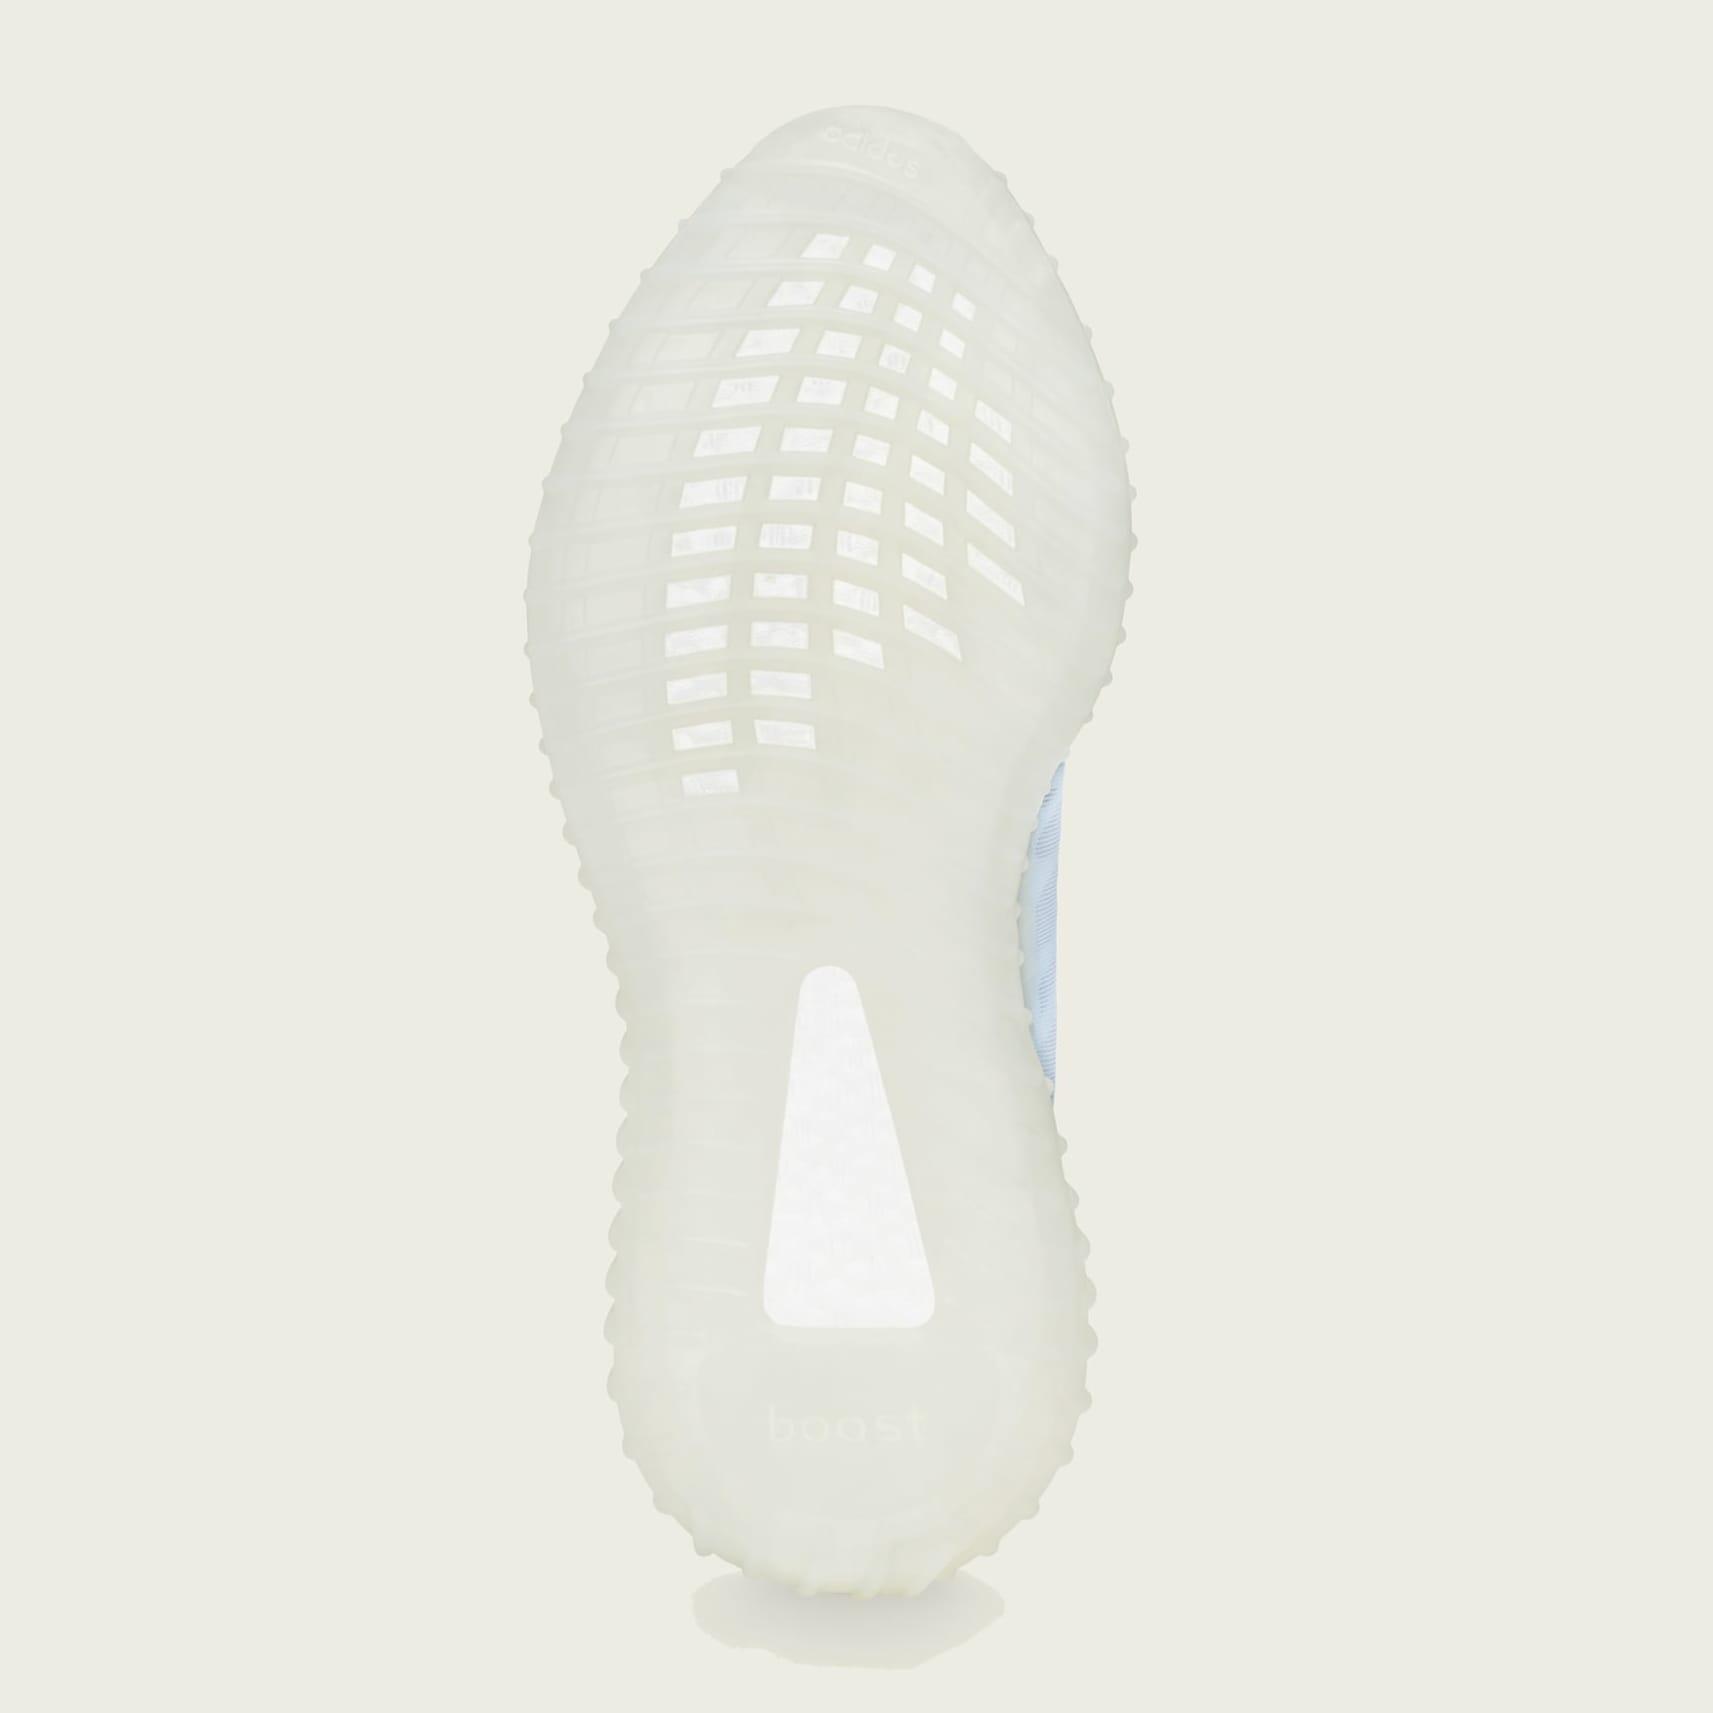 Adidas Yeezy Boost 350 V2 'Mono Ice' GW2869 Outsole